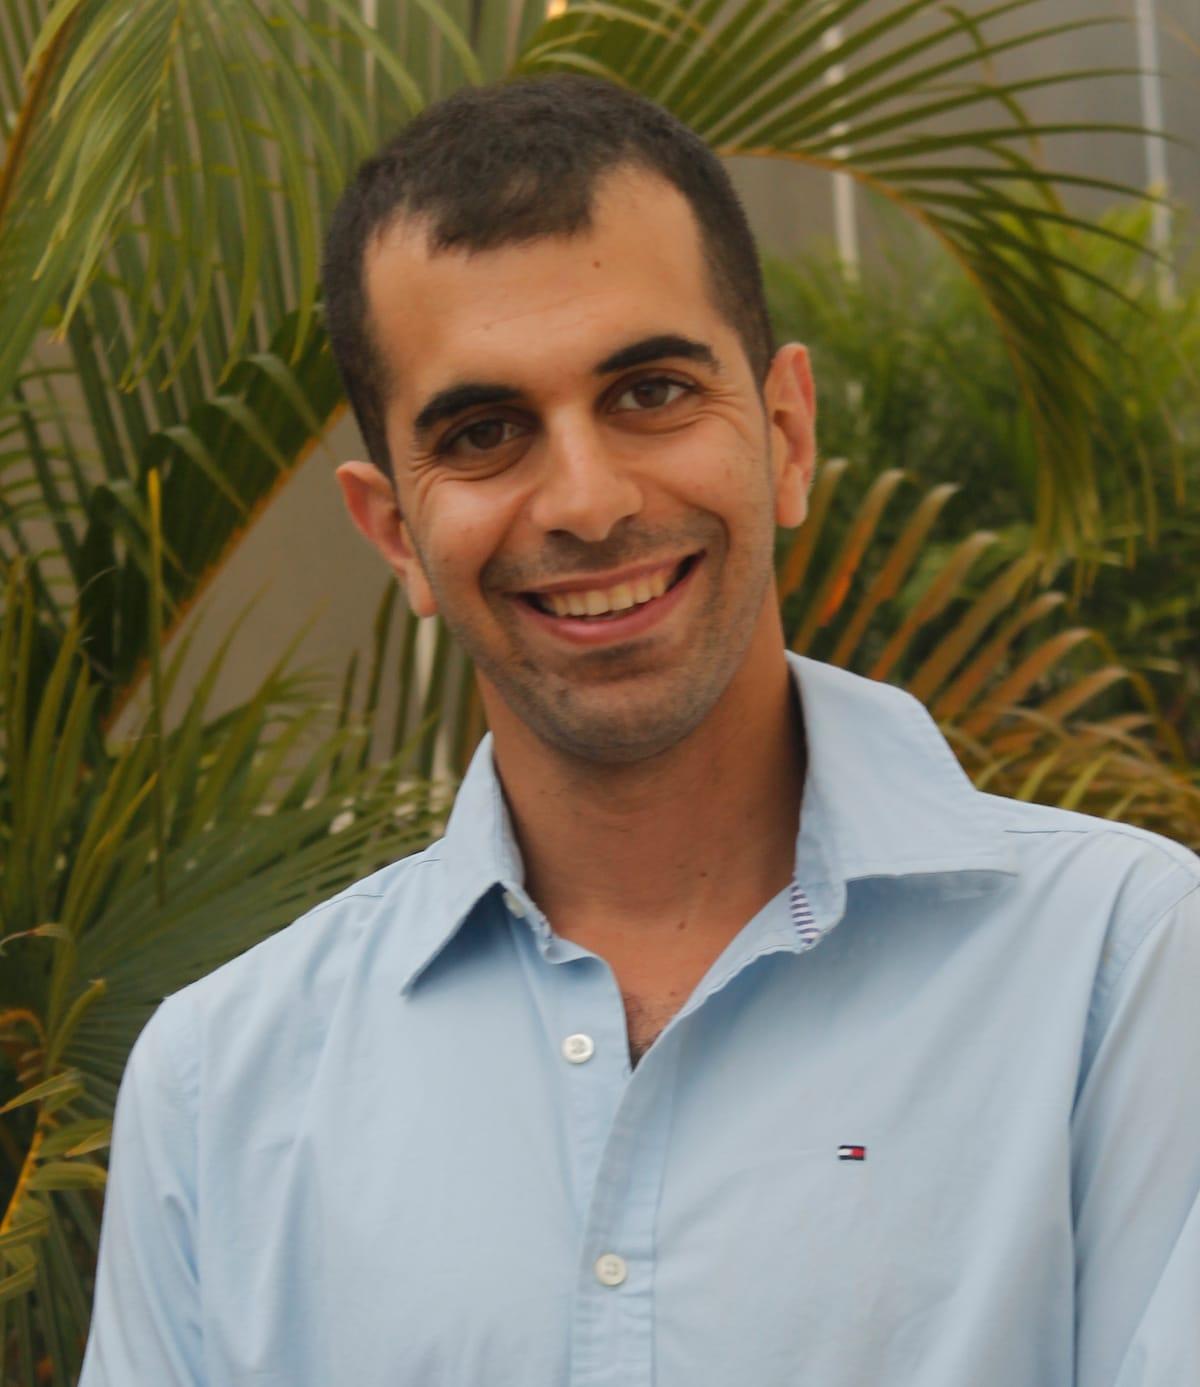 Yogev from Netanya